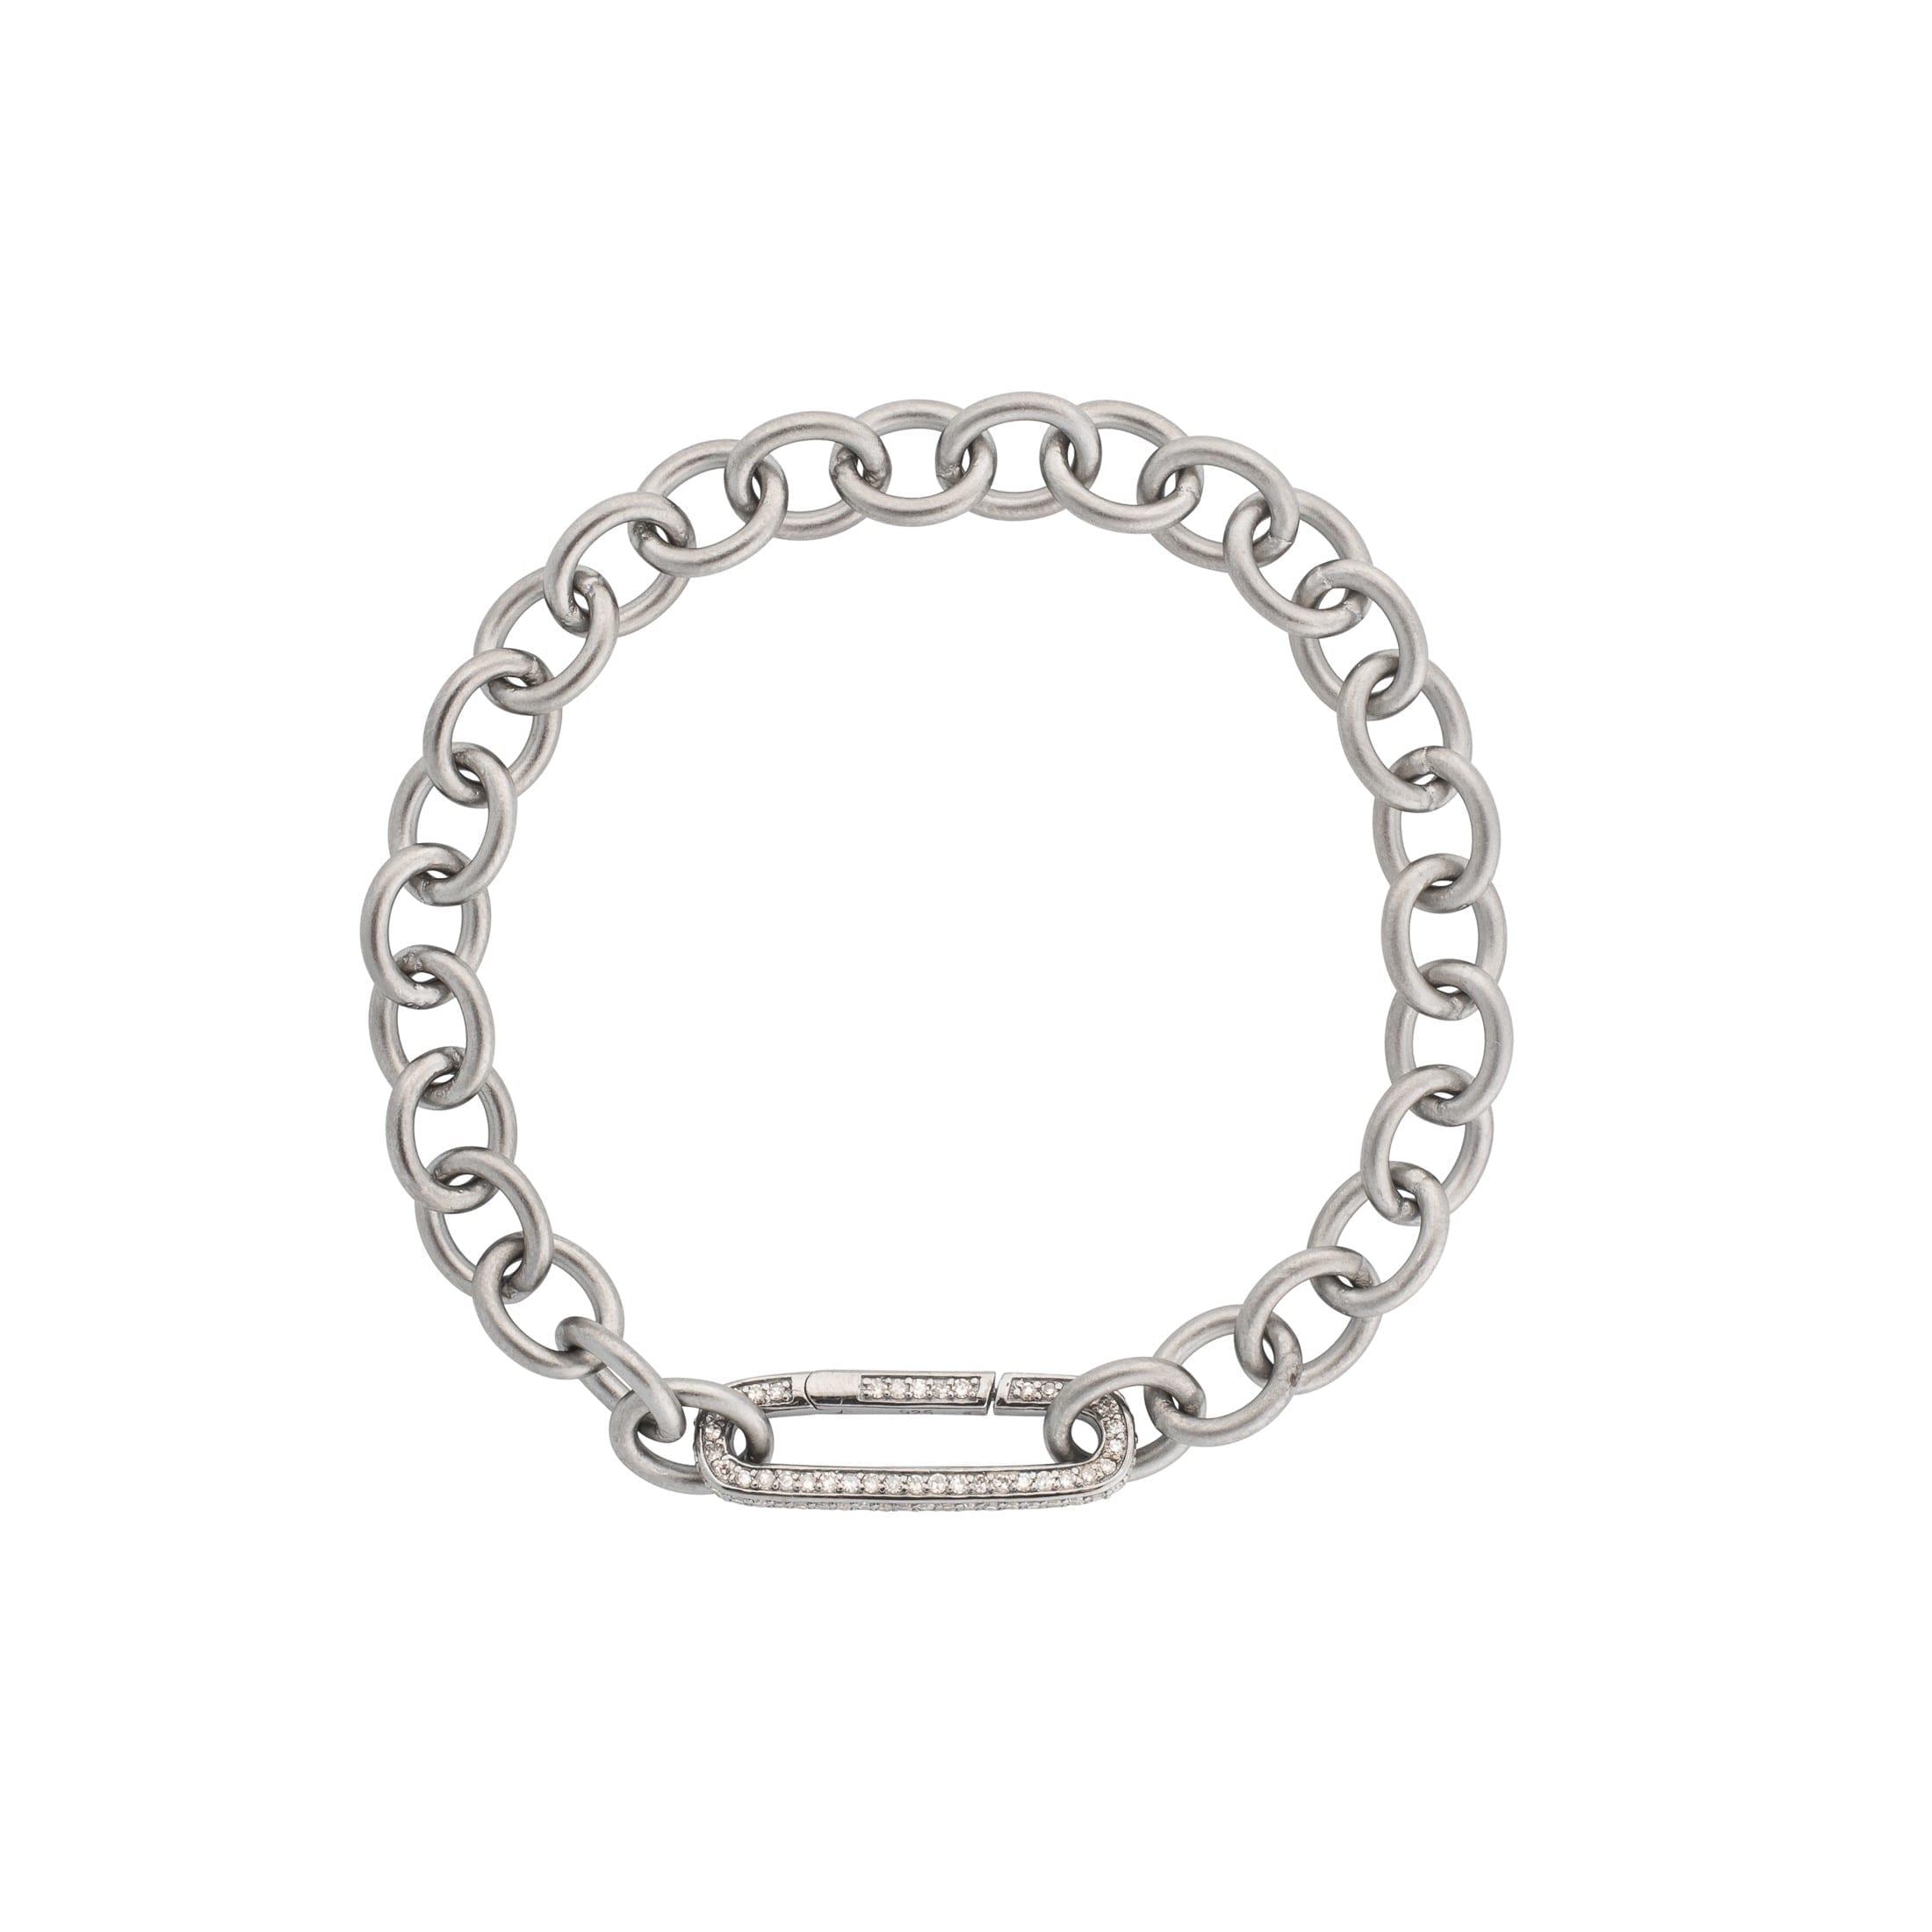 Medium Round Chain Link Bracelet + Pave Diamond Link Connector Clasp